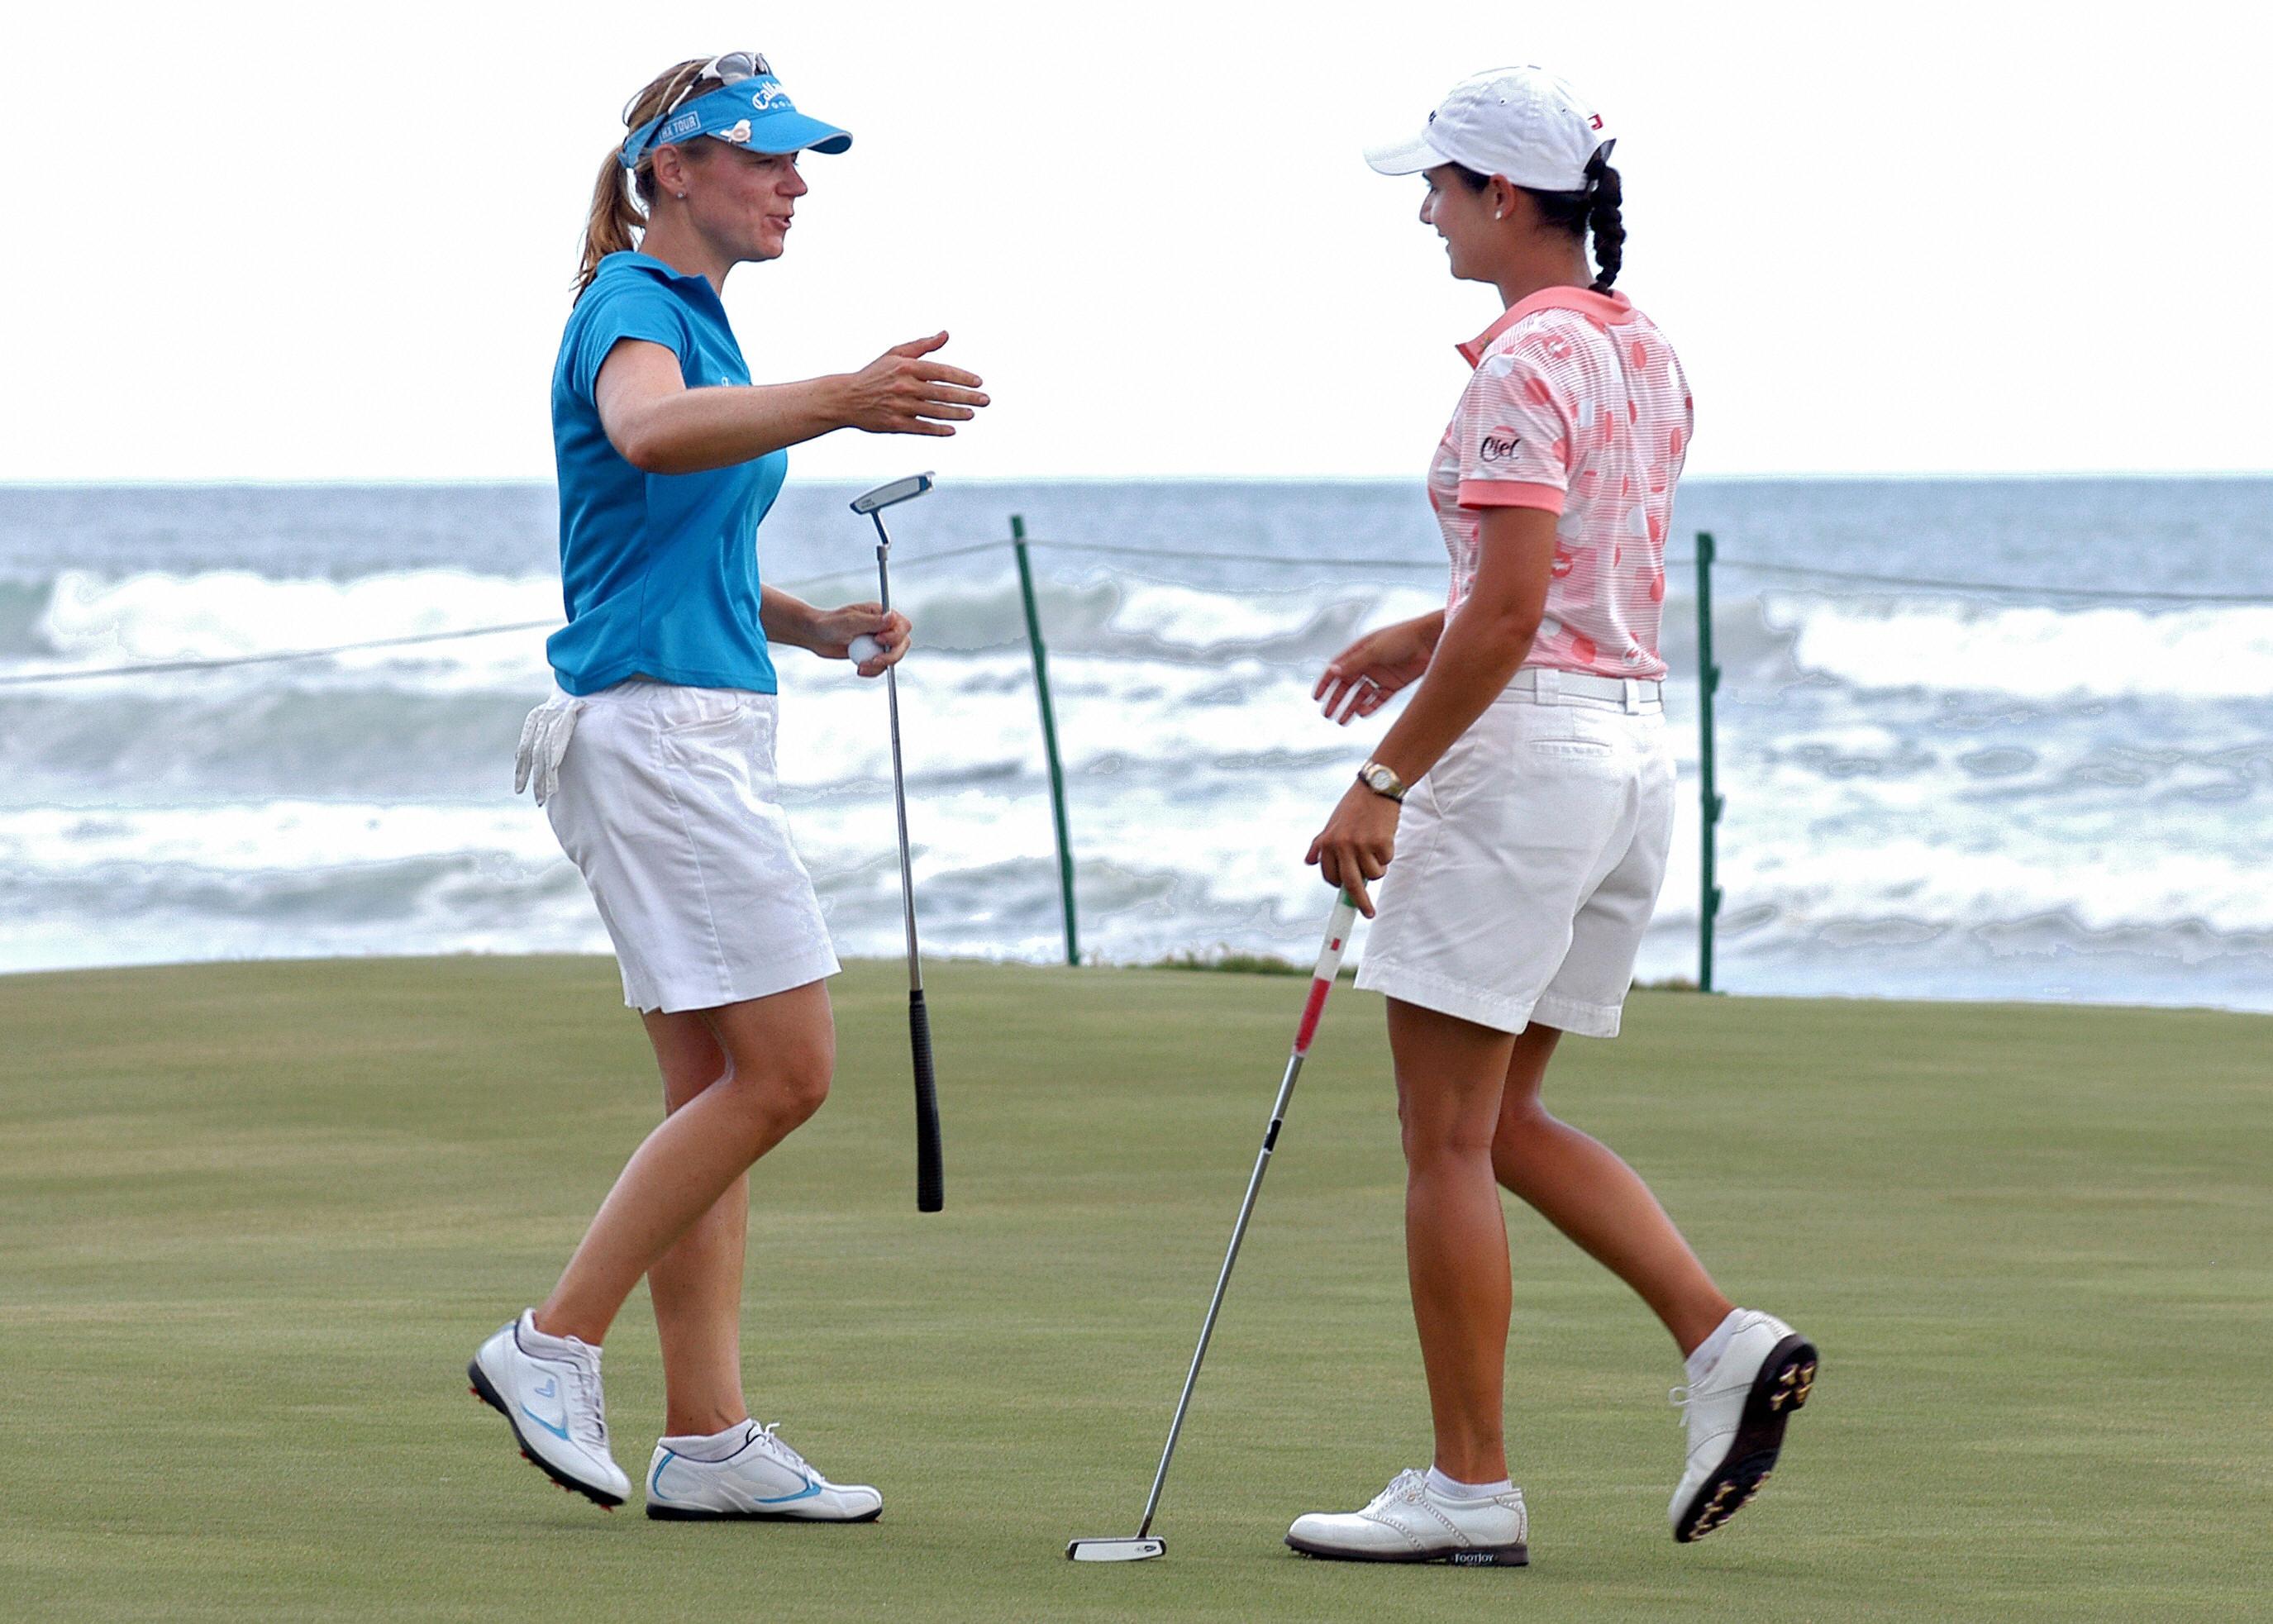 Mexican golfer Ana Lorena Ochoa (R) talk